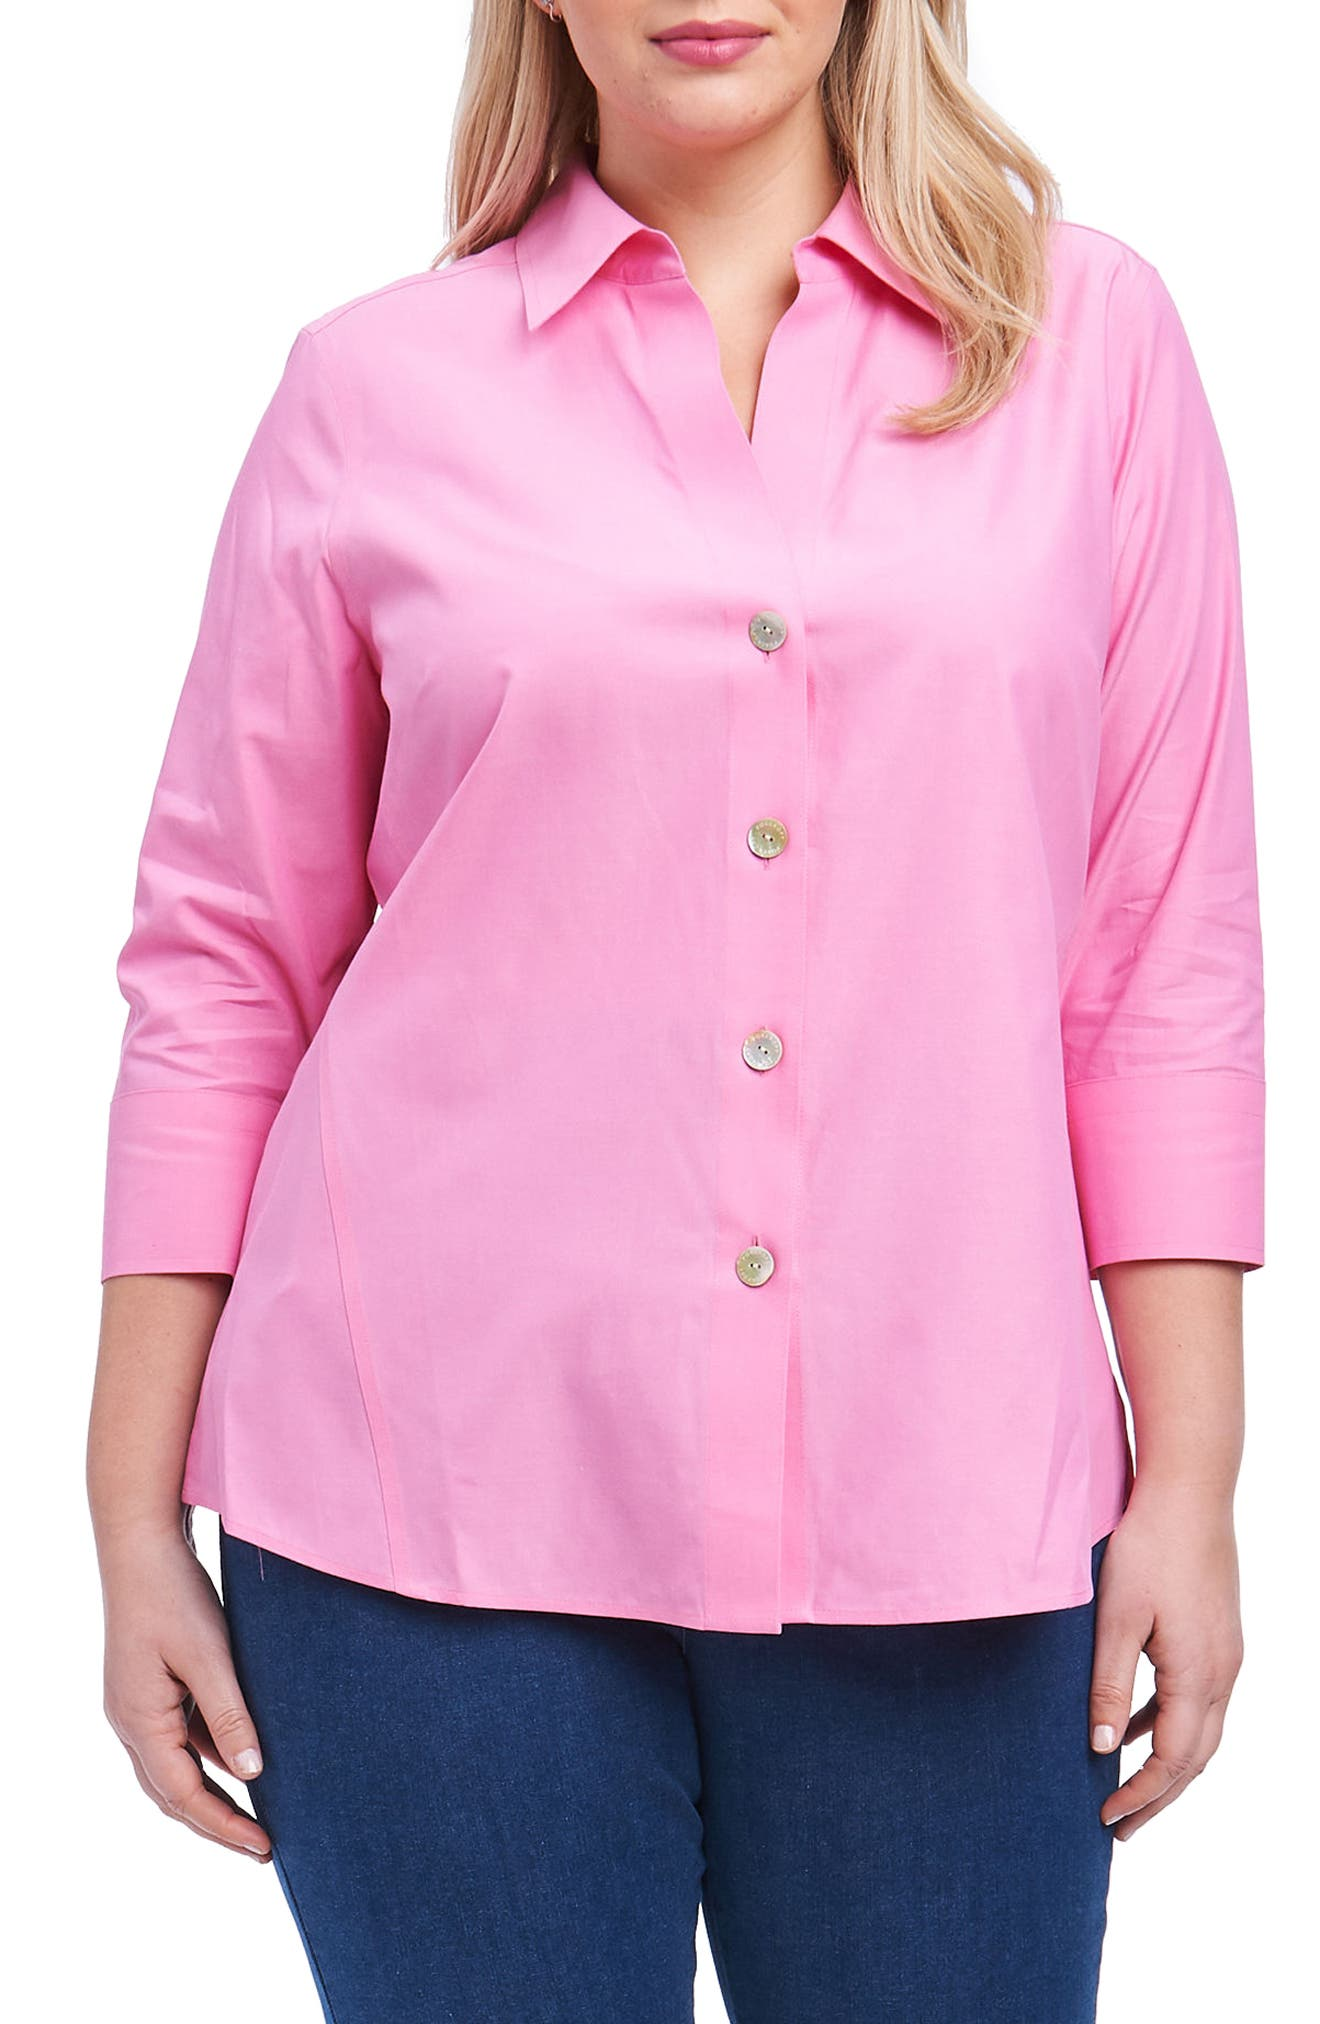 Alternate Image 1 Selected - Foxcroft 'Paige' Non-Iron Cotton Shirt (Plus Size)